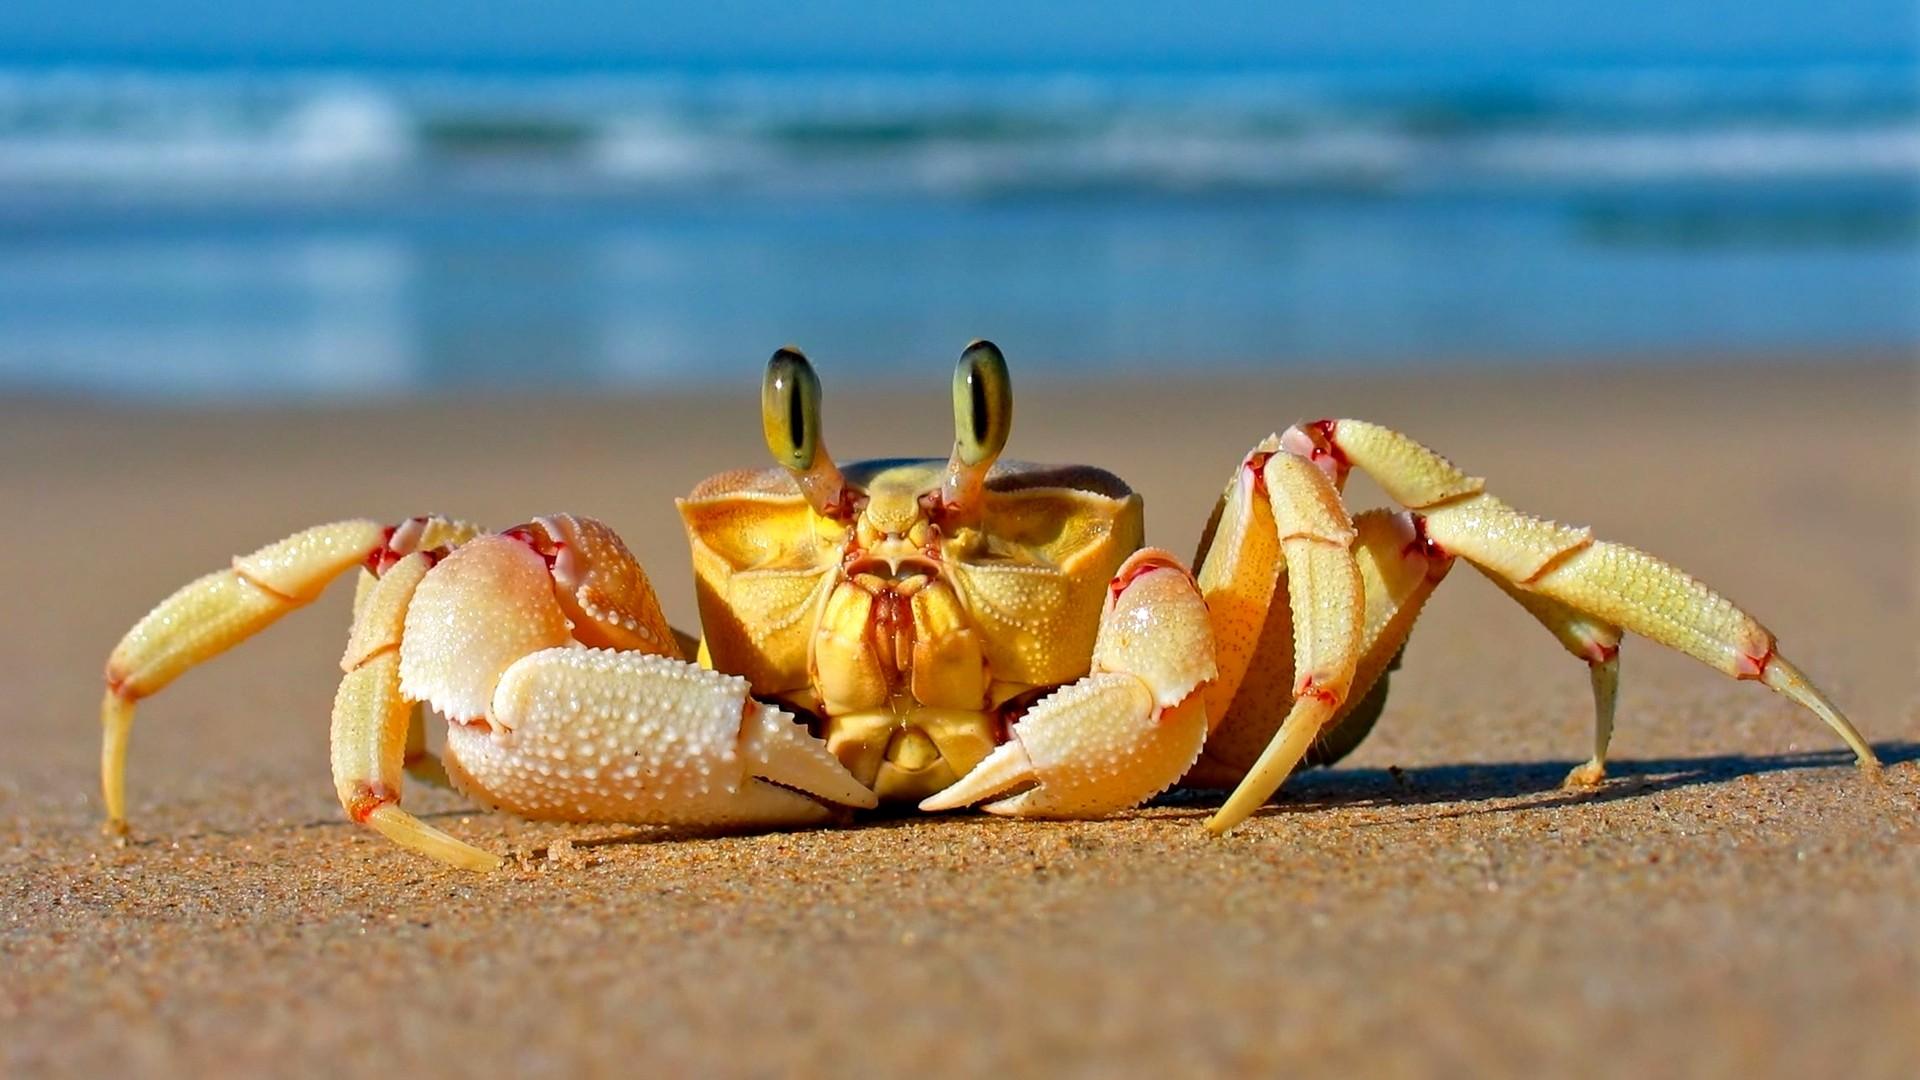 Wallpaper Crab, Mediterranean sea, sand, funny, cute animals, Animals #4077